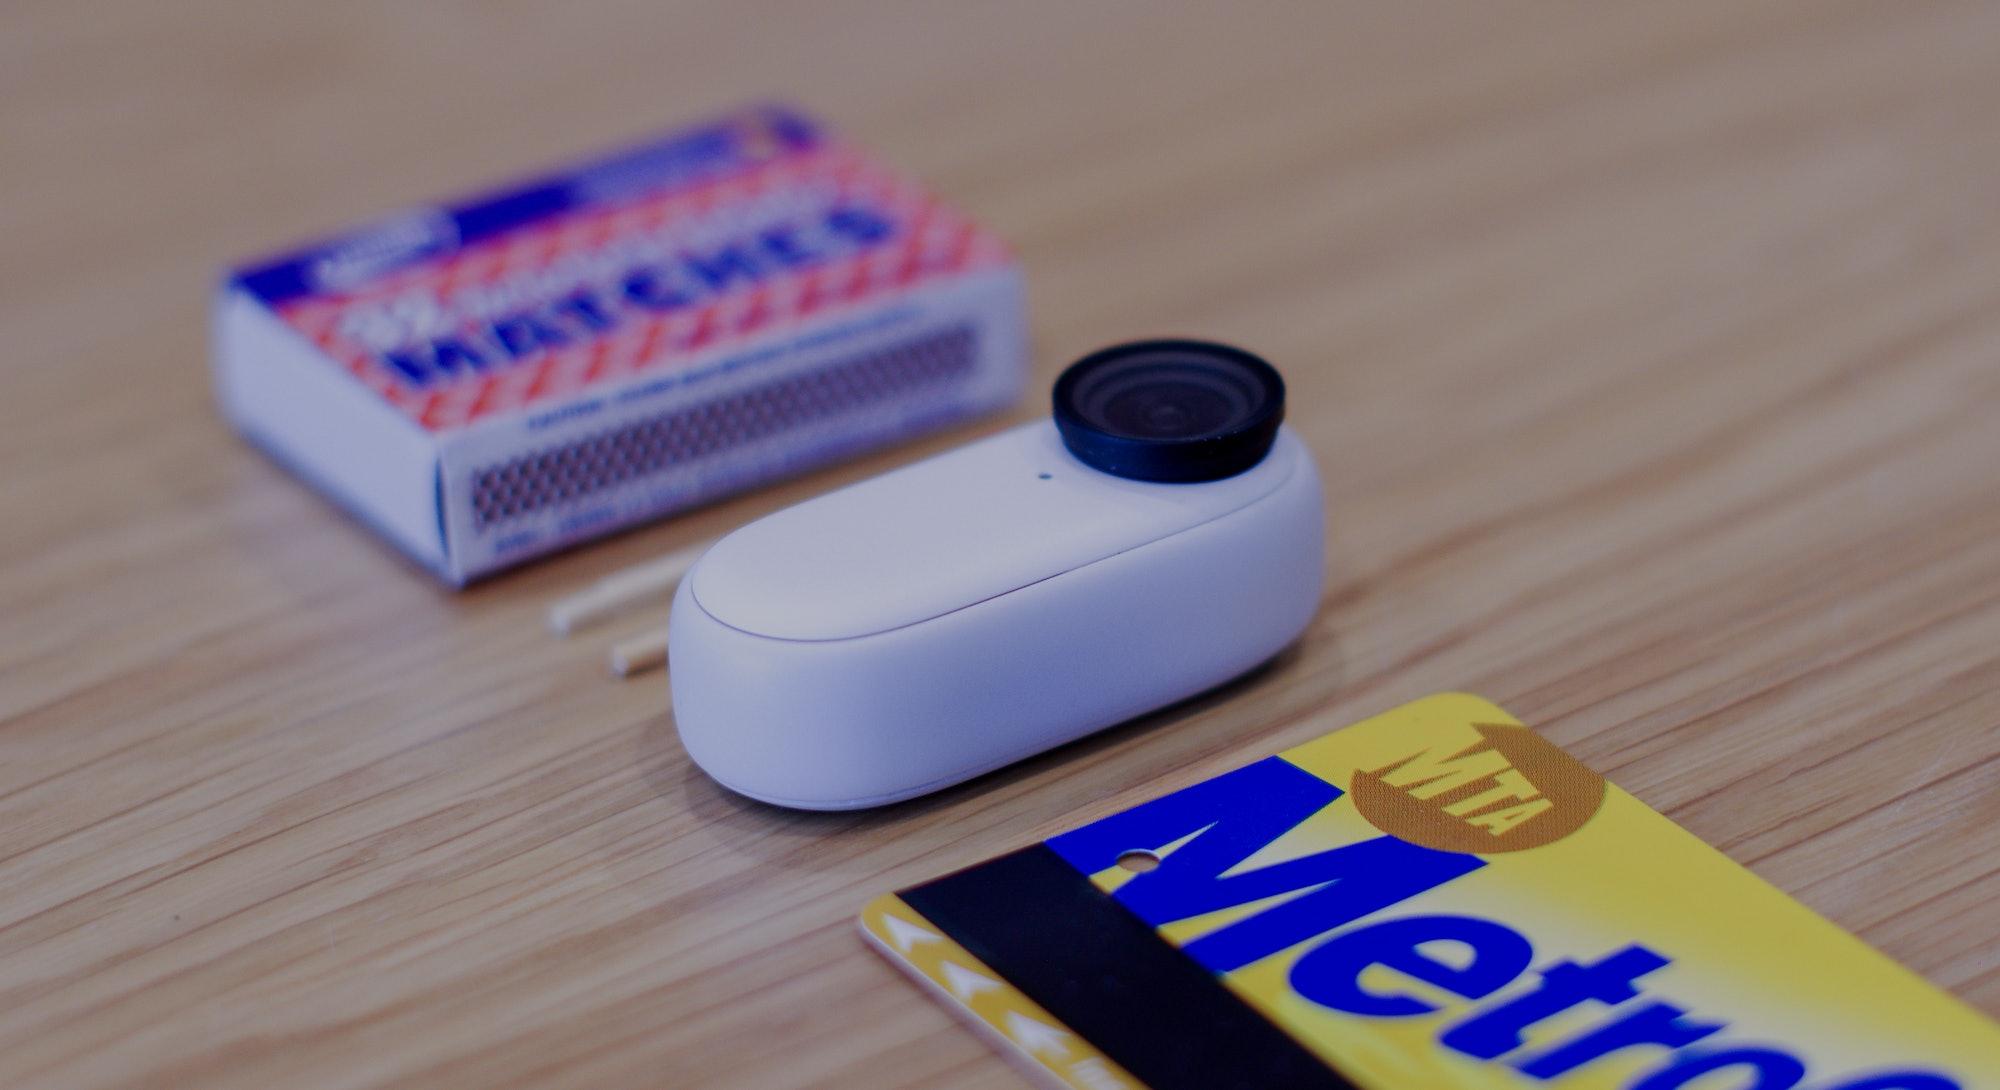 Insta360 Go 2 action cam review matchbox metrocard